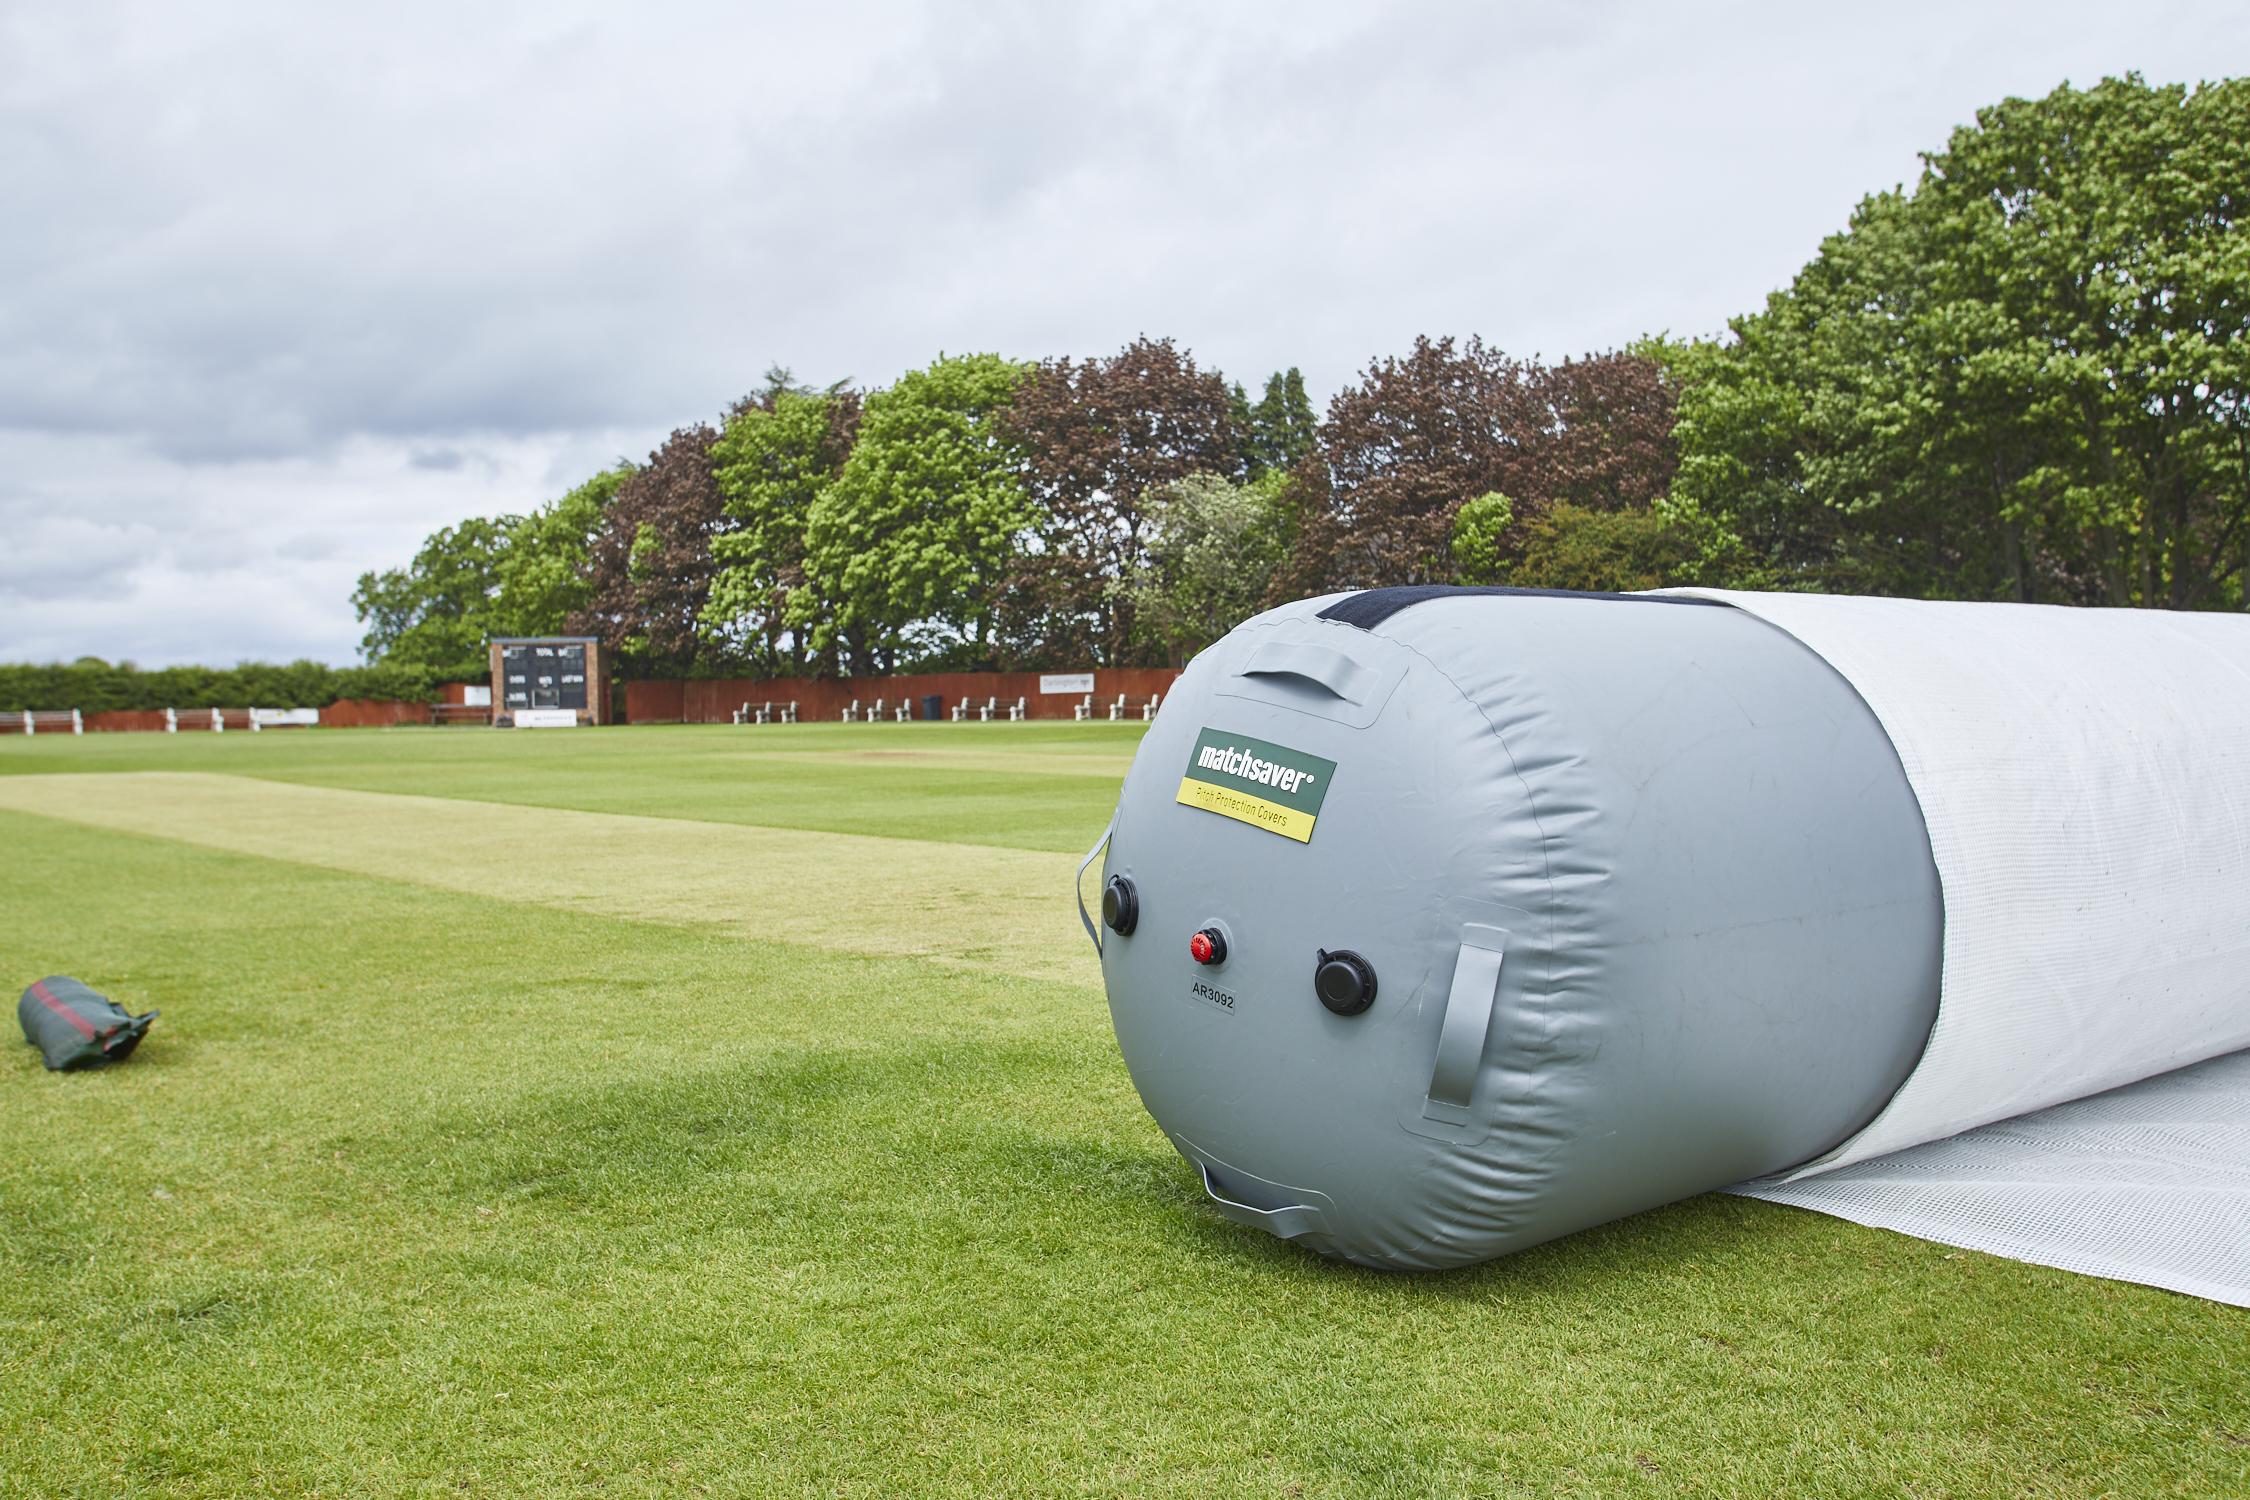 Cricket product shot